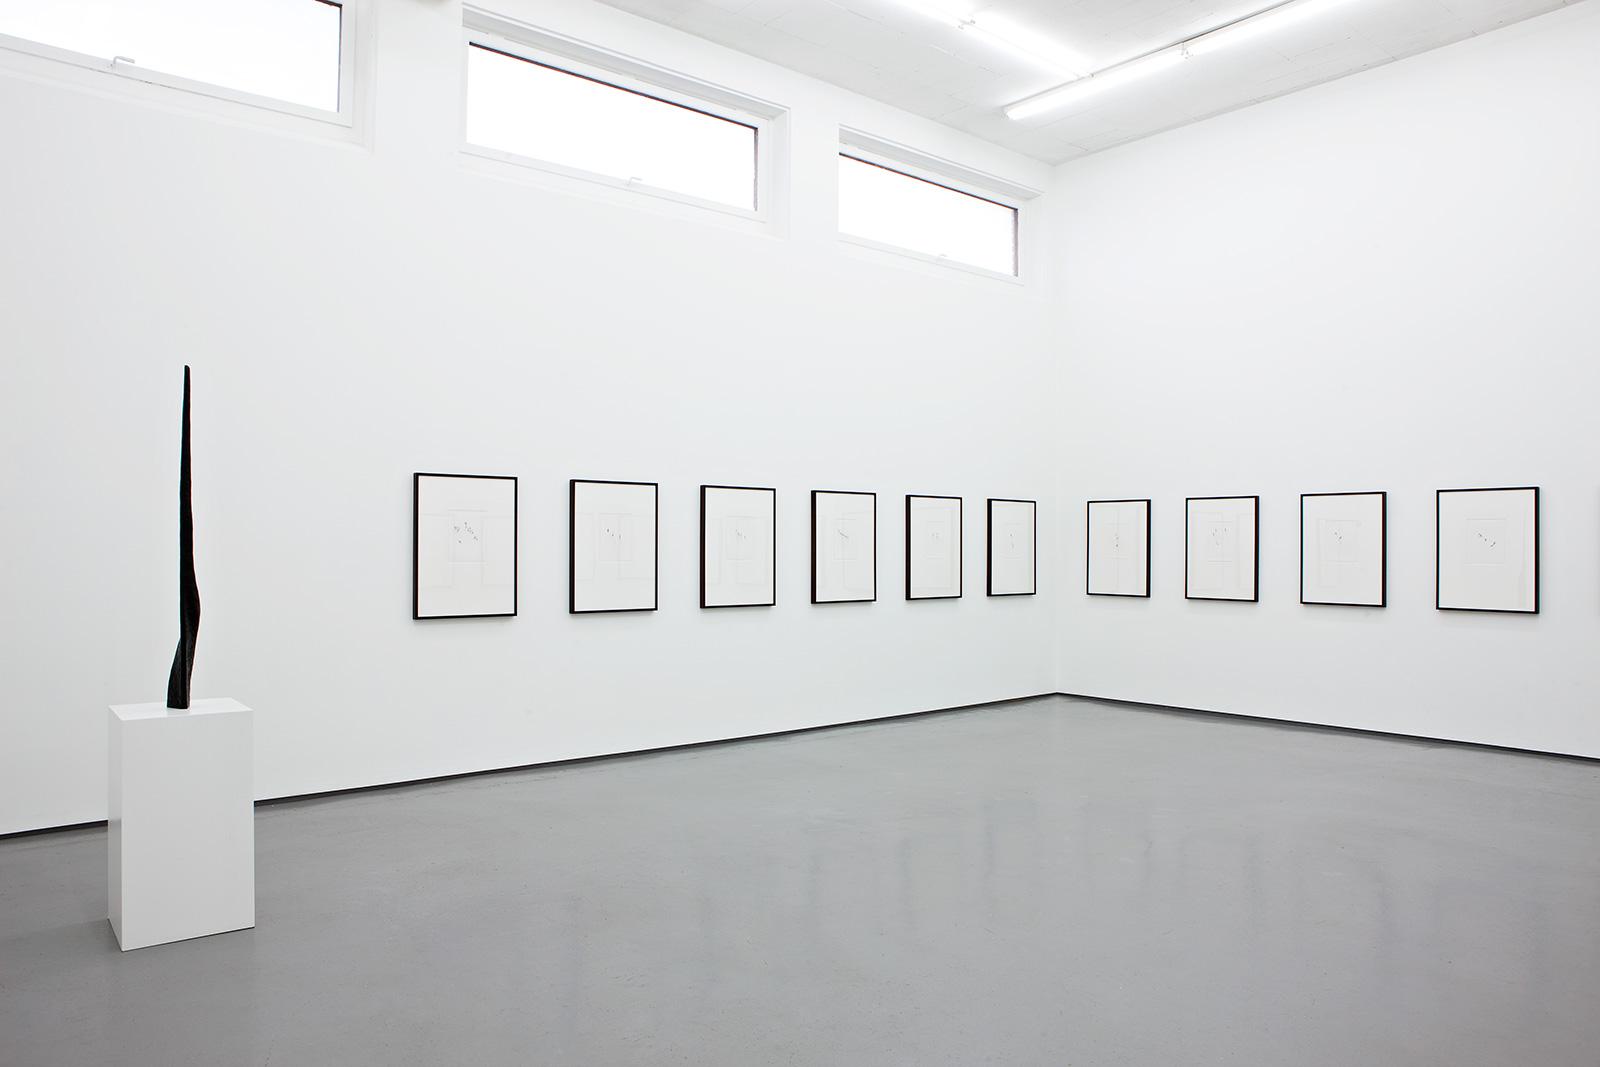 Installation view Jan Groth, New Drawings, Galleri Riis, Oslo, 2012